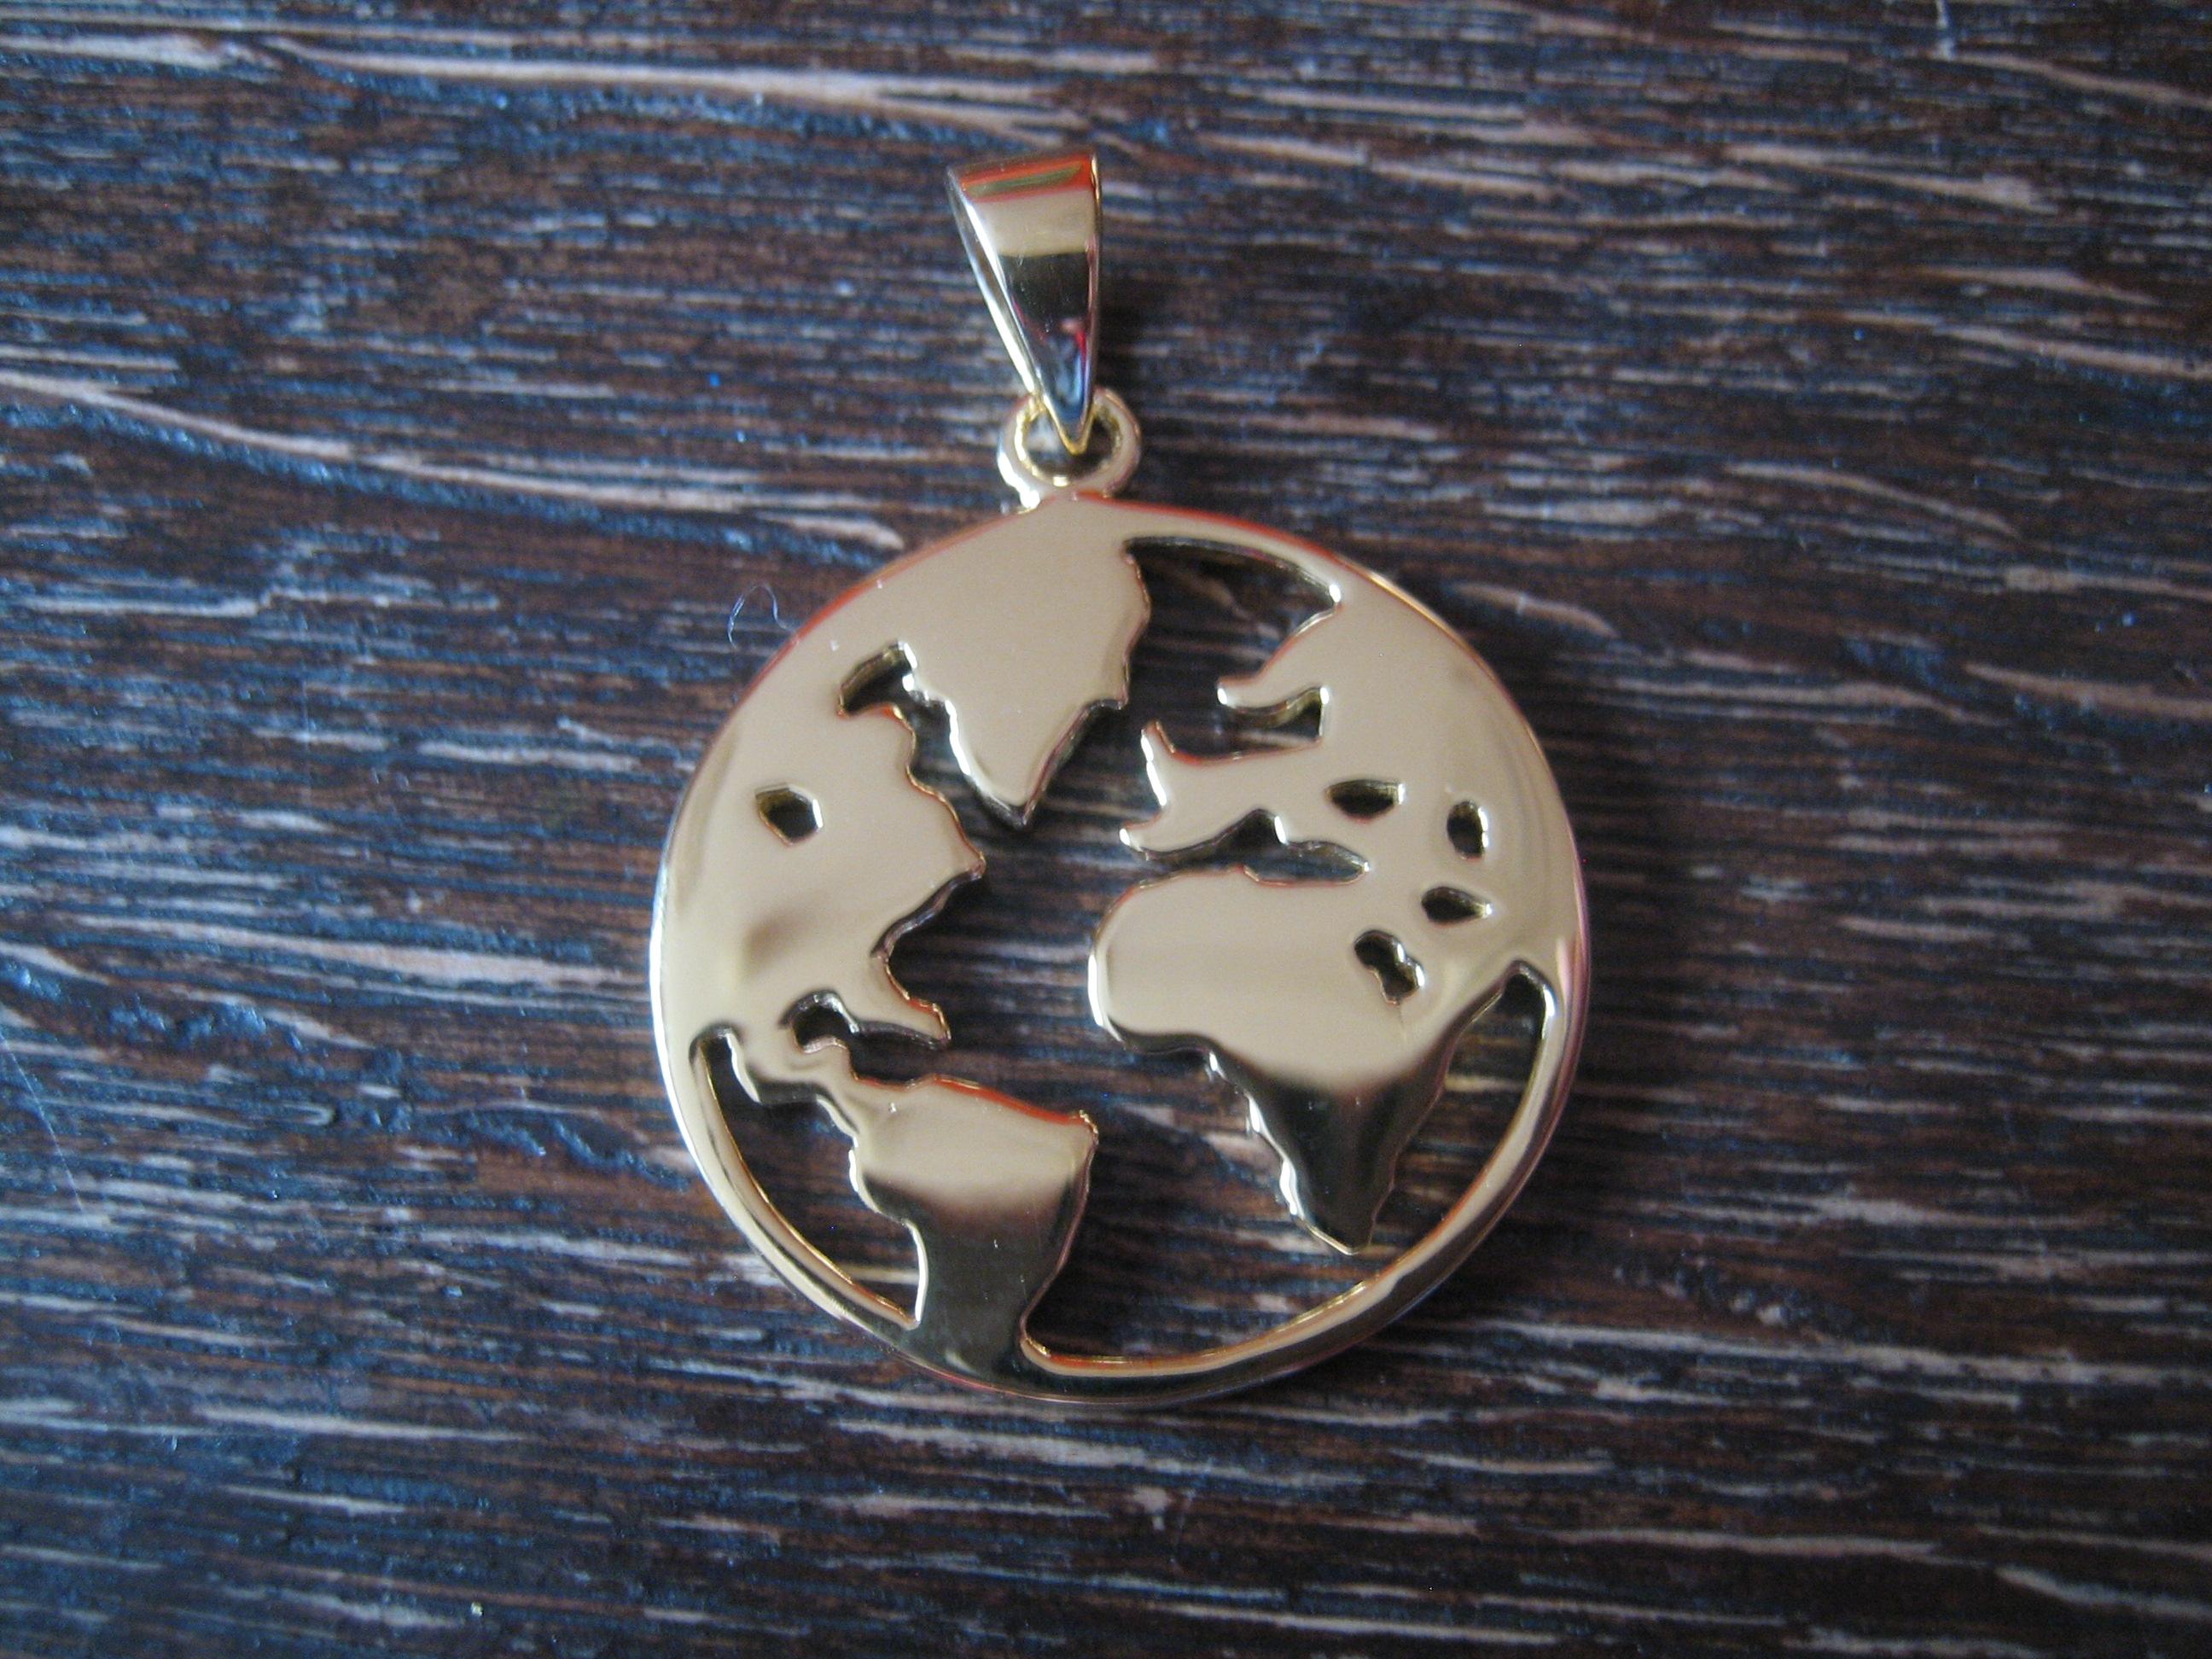 1 Silber Kette mit hübschen Seestern Anhänger aus 925er Silber maritimes Motiv